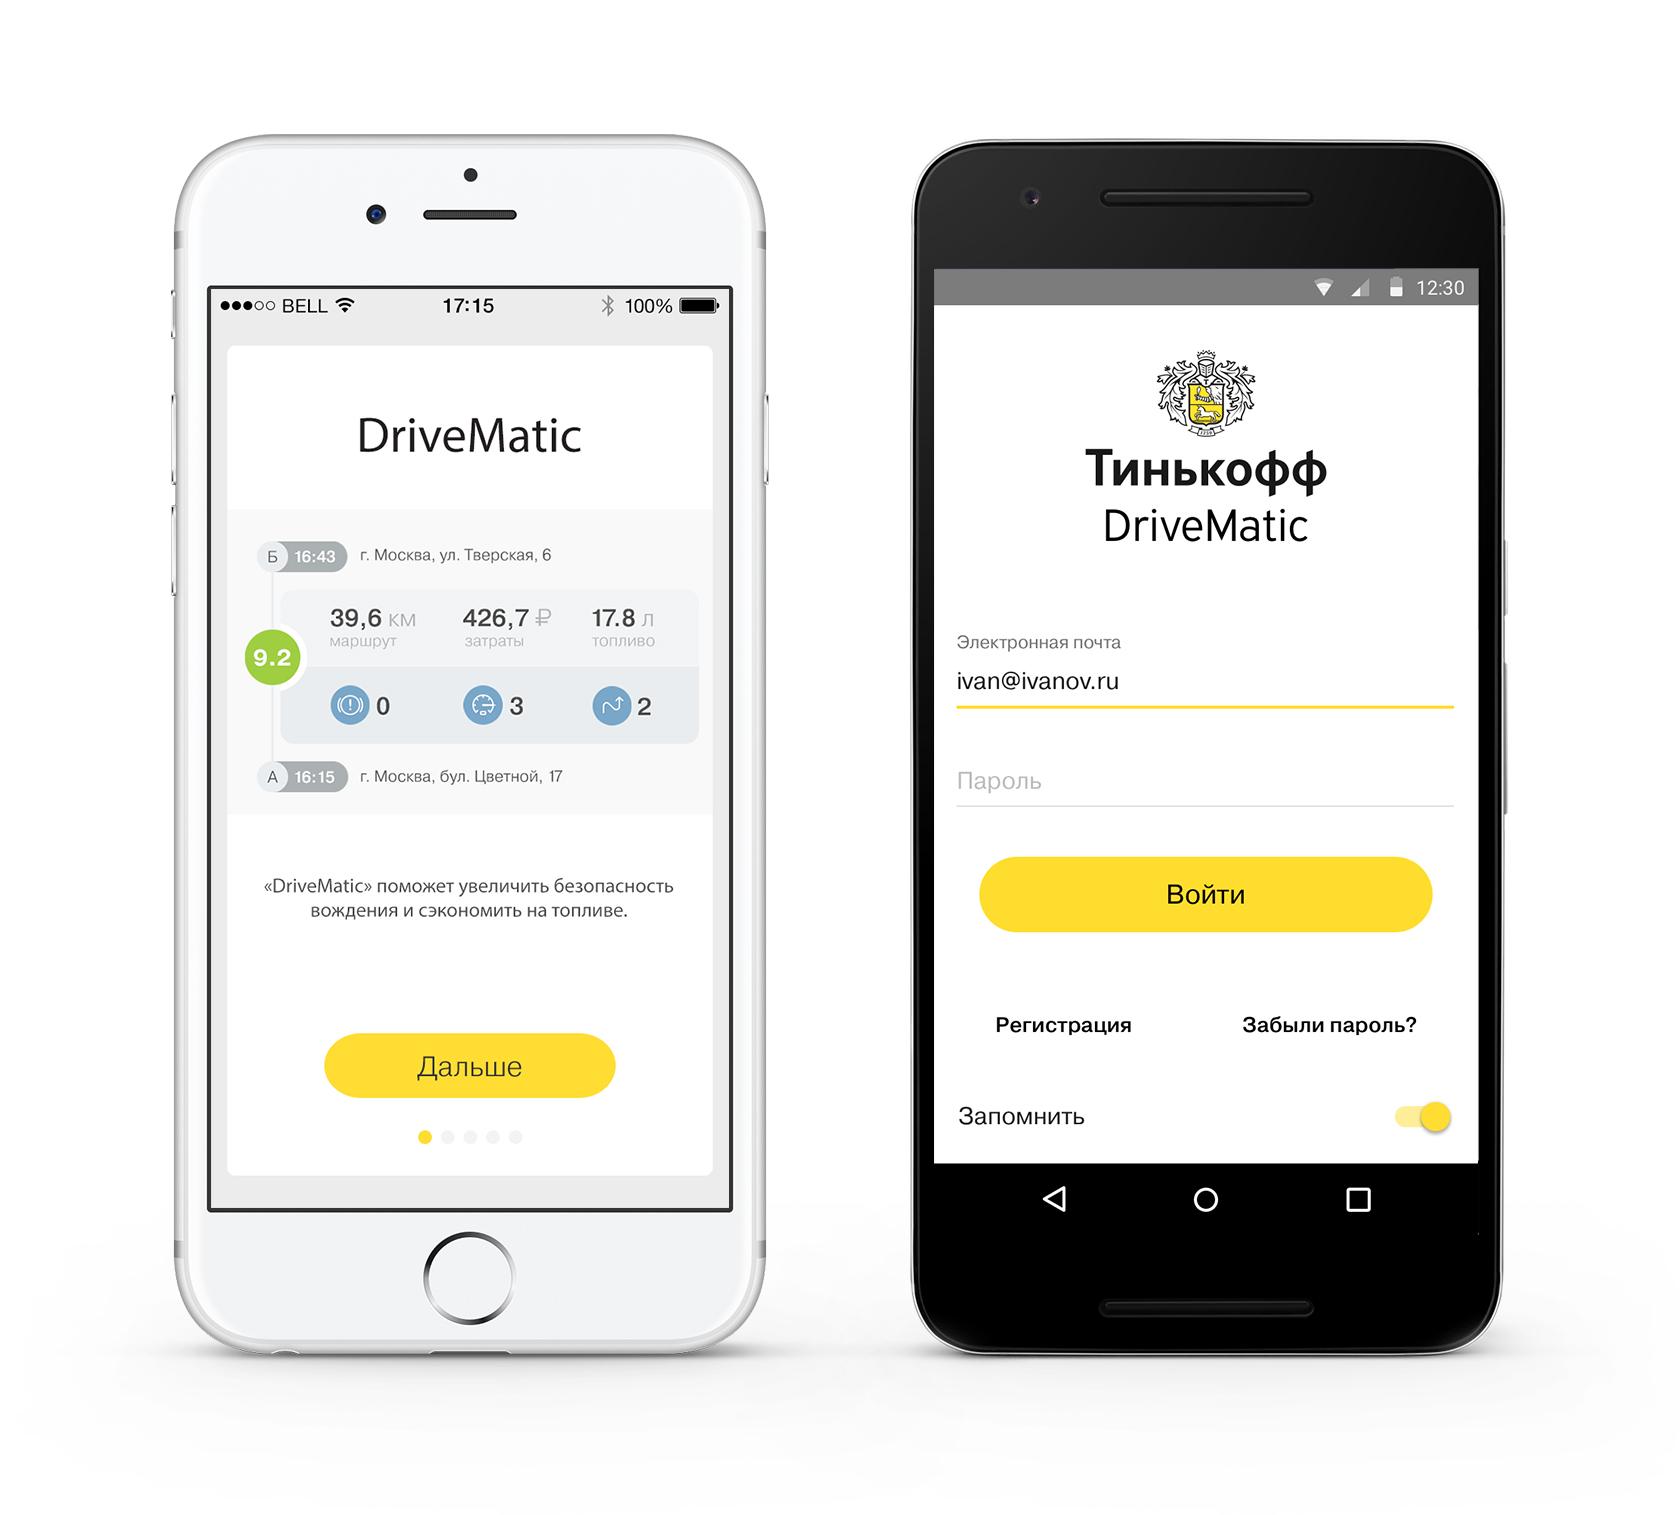 Тинькофф DriveMatic, iOS, Android